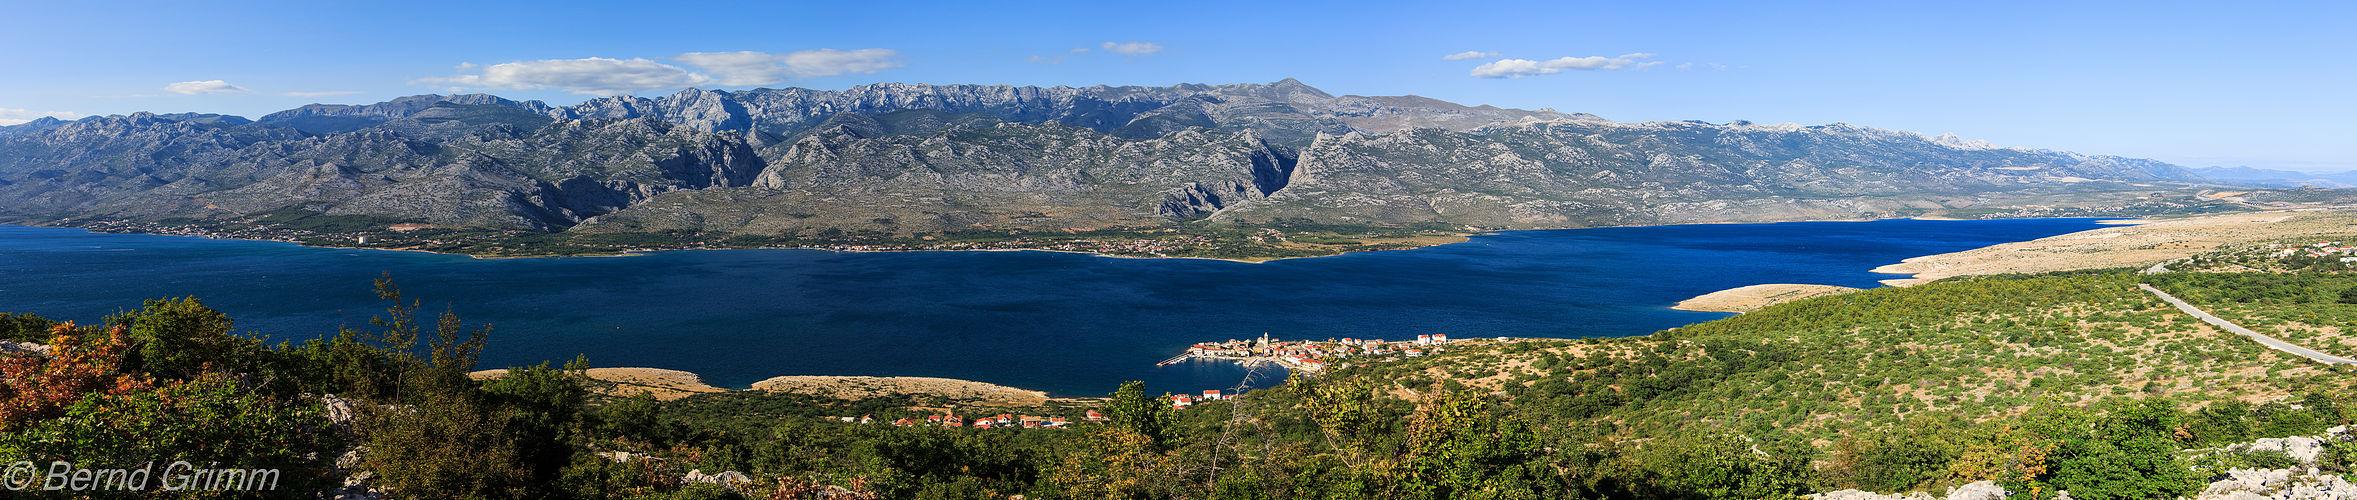 Kroatien: Velebitgebirge..